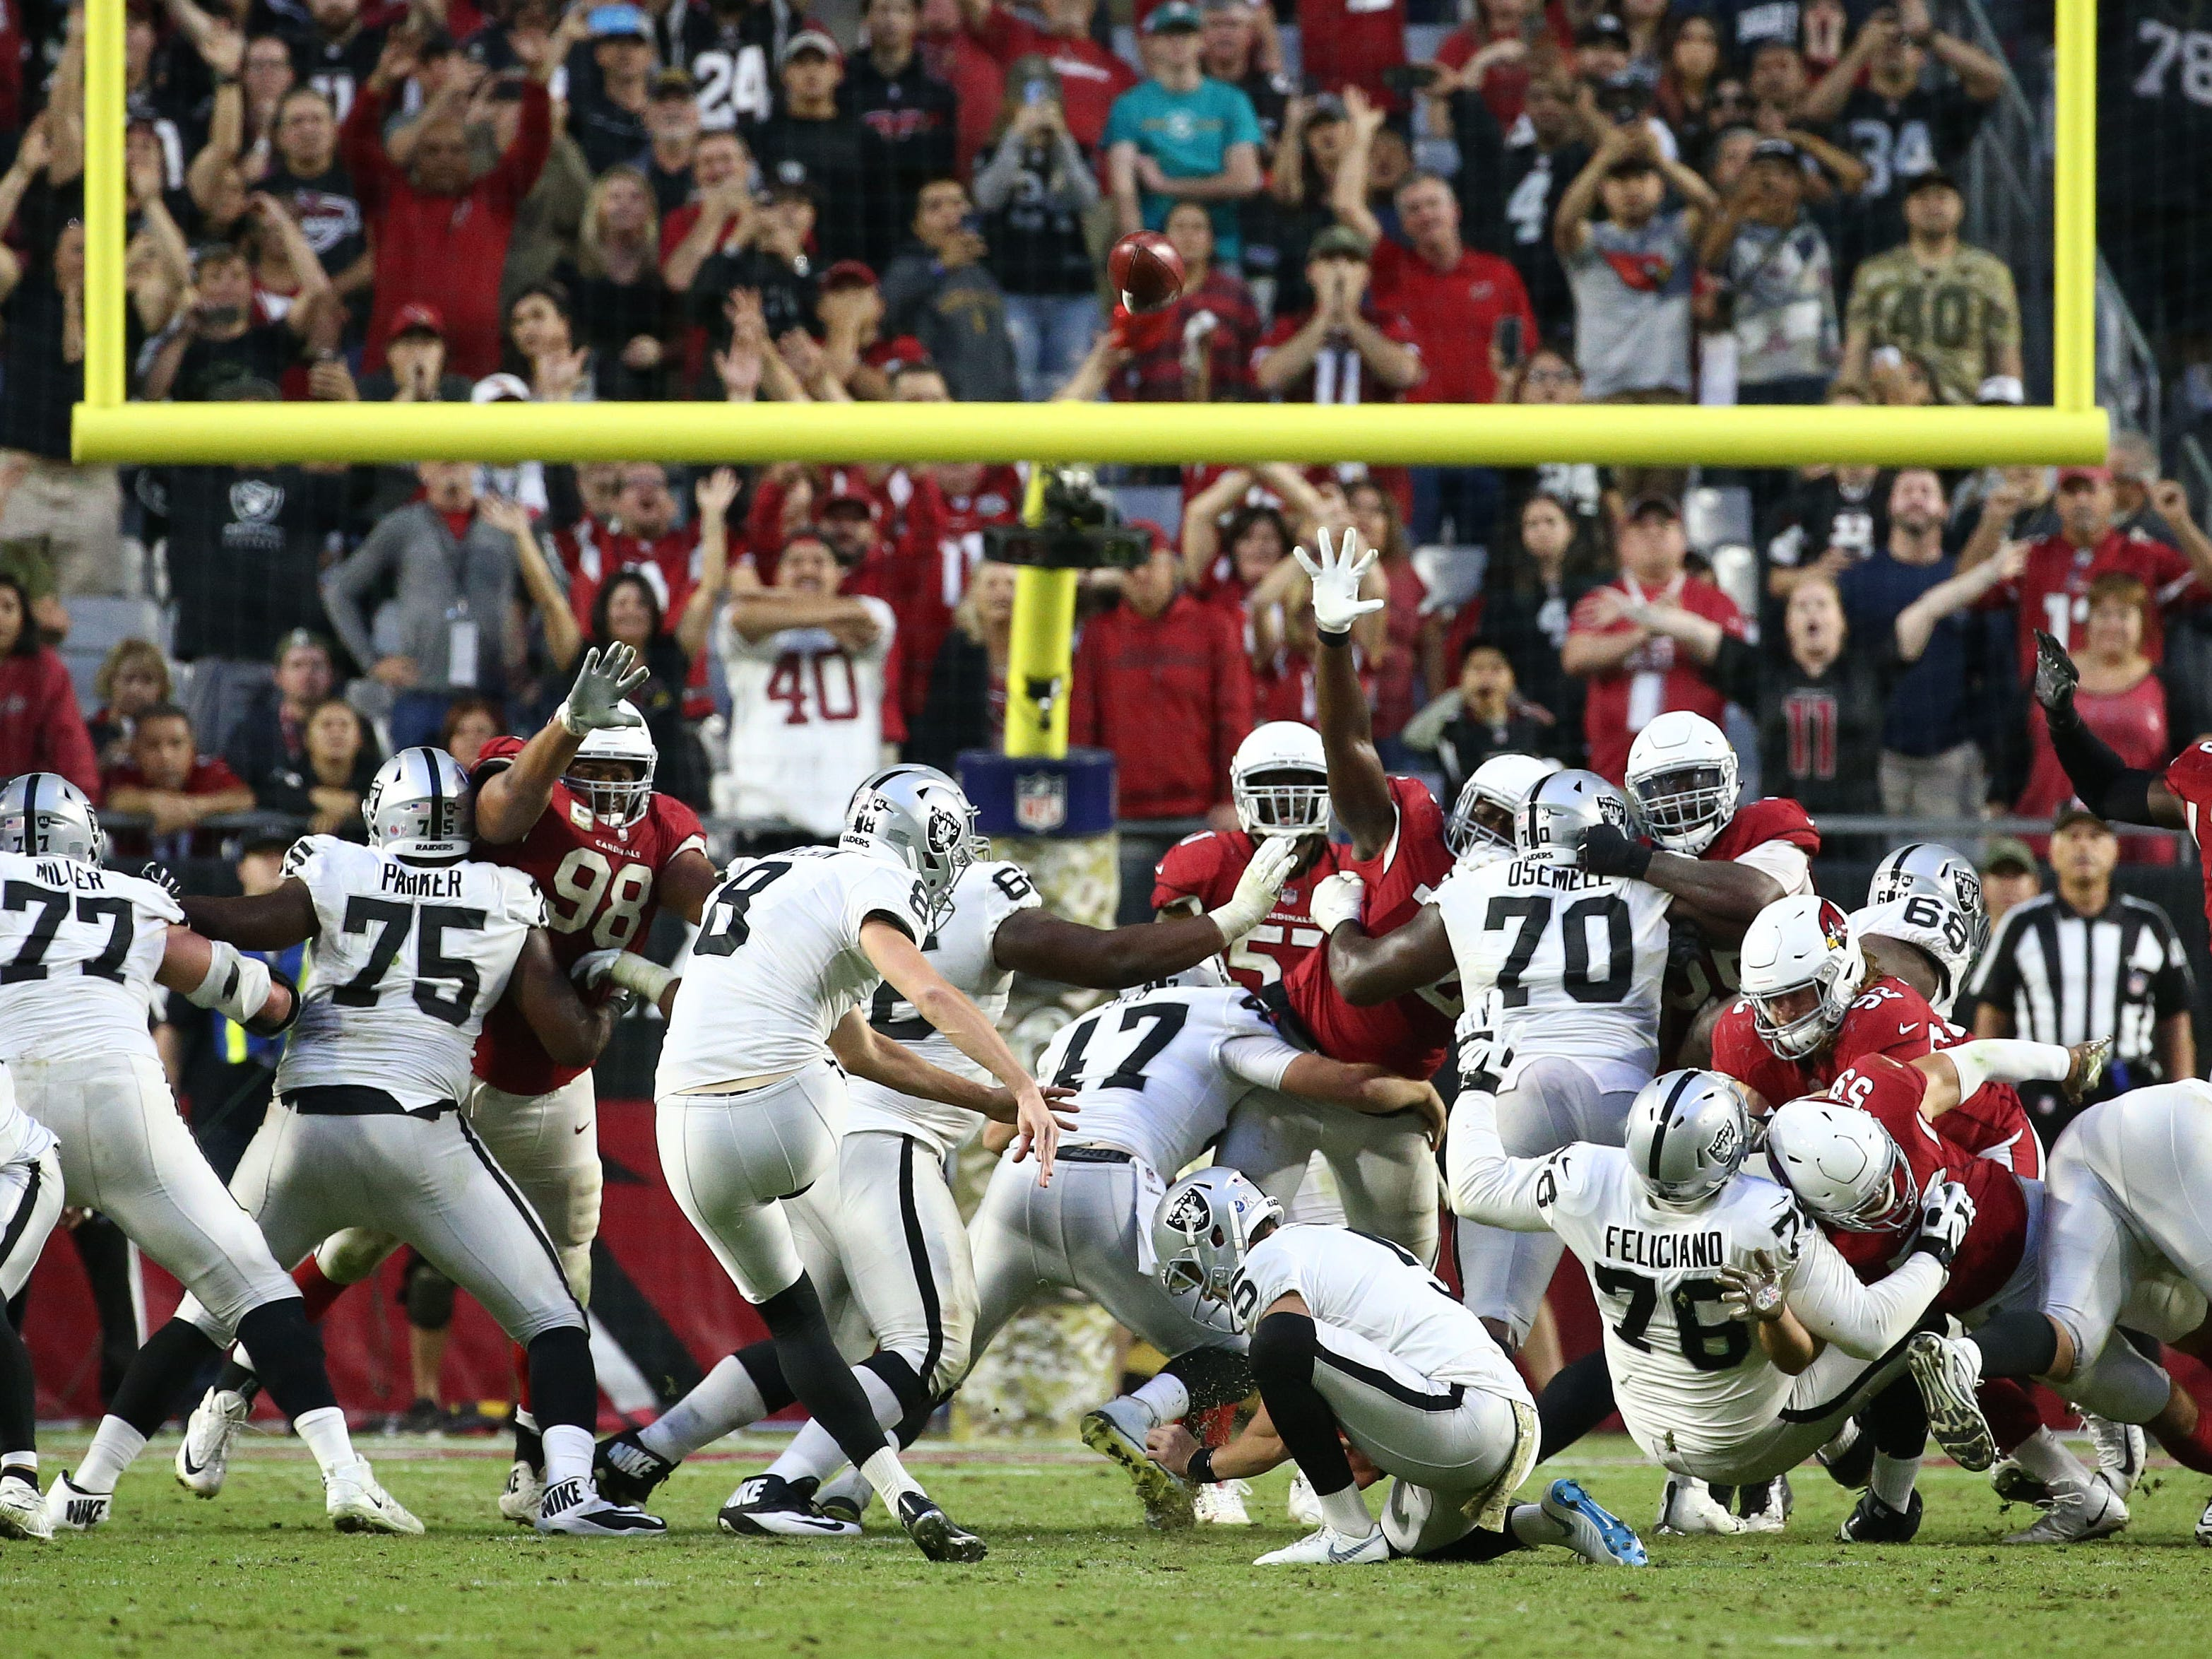 Oakland Raiders' Daniel Carlson (8) kicks a game winning field goal to end the game against the Arizona Cardinals on Nov. 18 at State Farm Stadium.